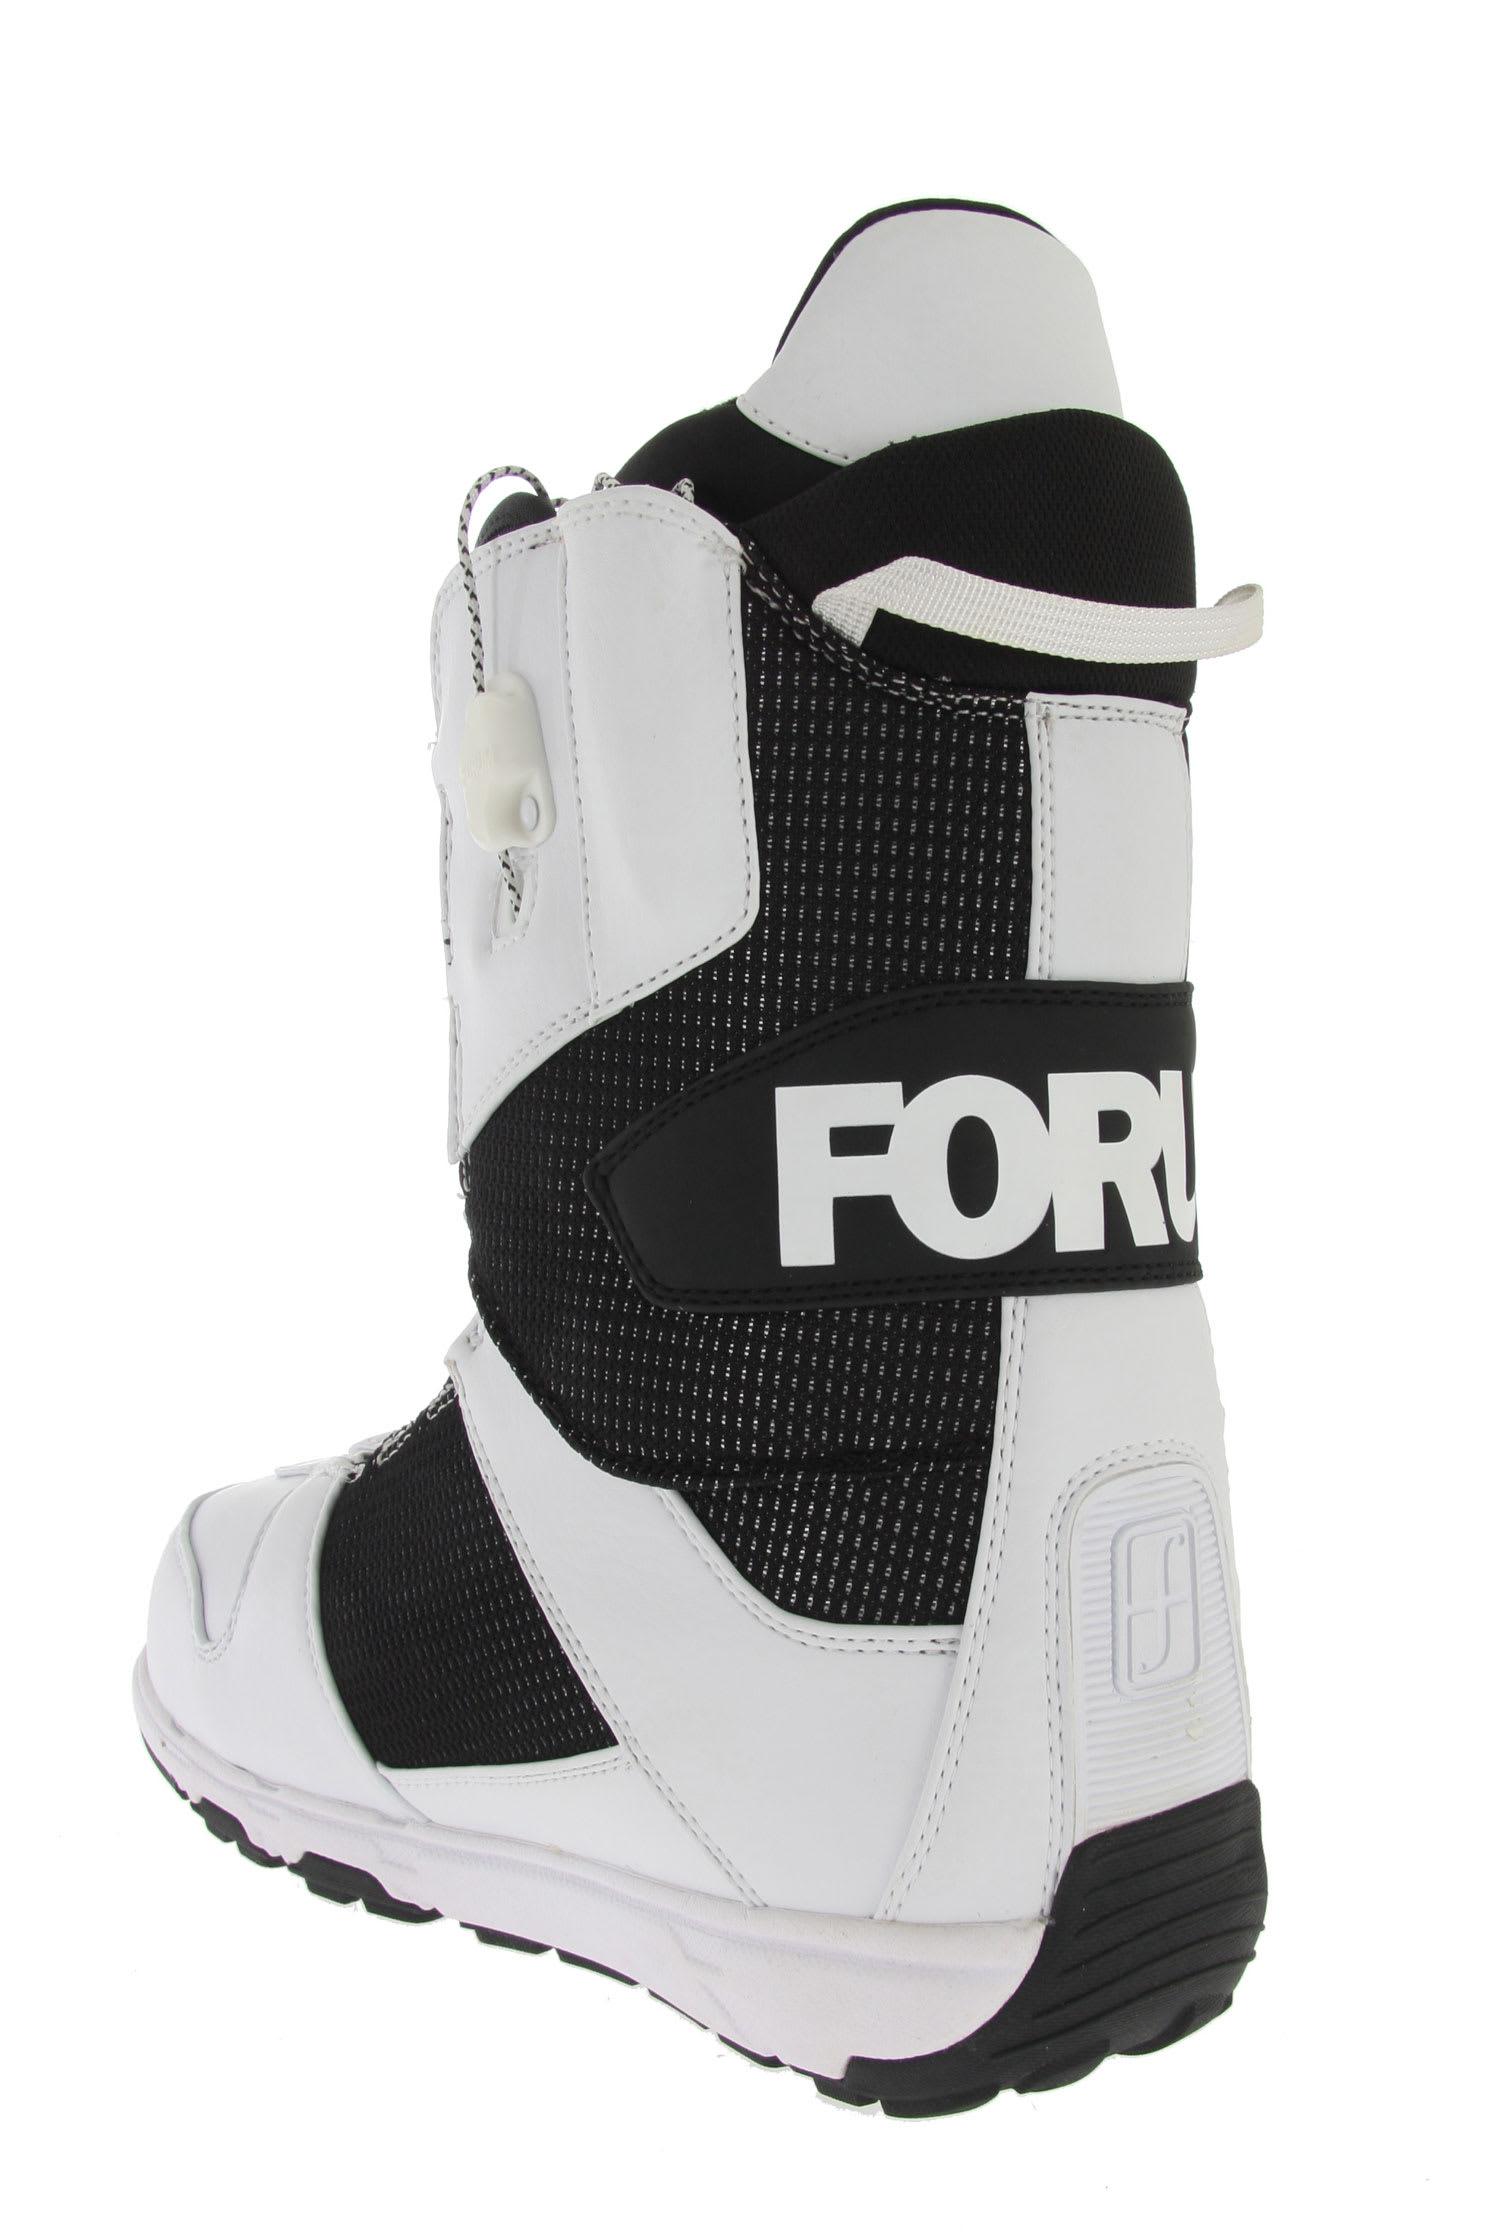 Forum Kicker SLR Snowboard Boots 2009 | evo |Snowboarding Kickers